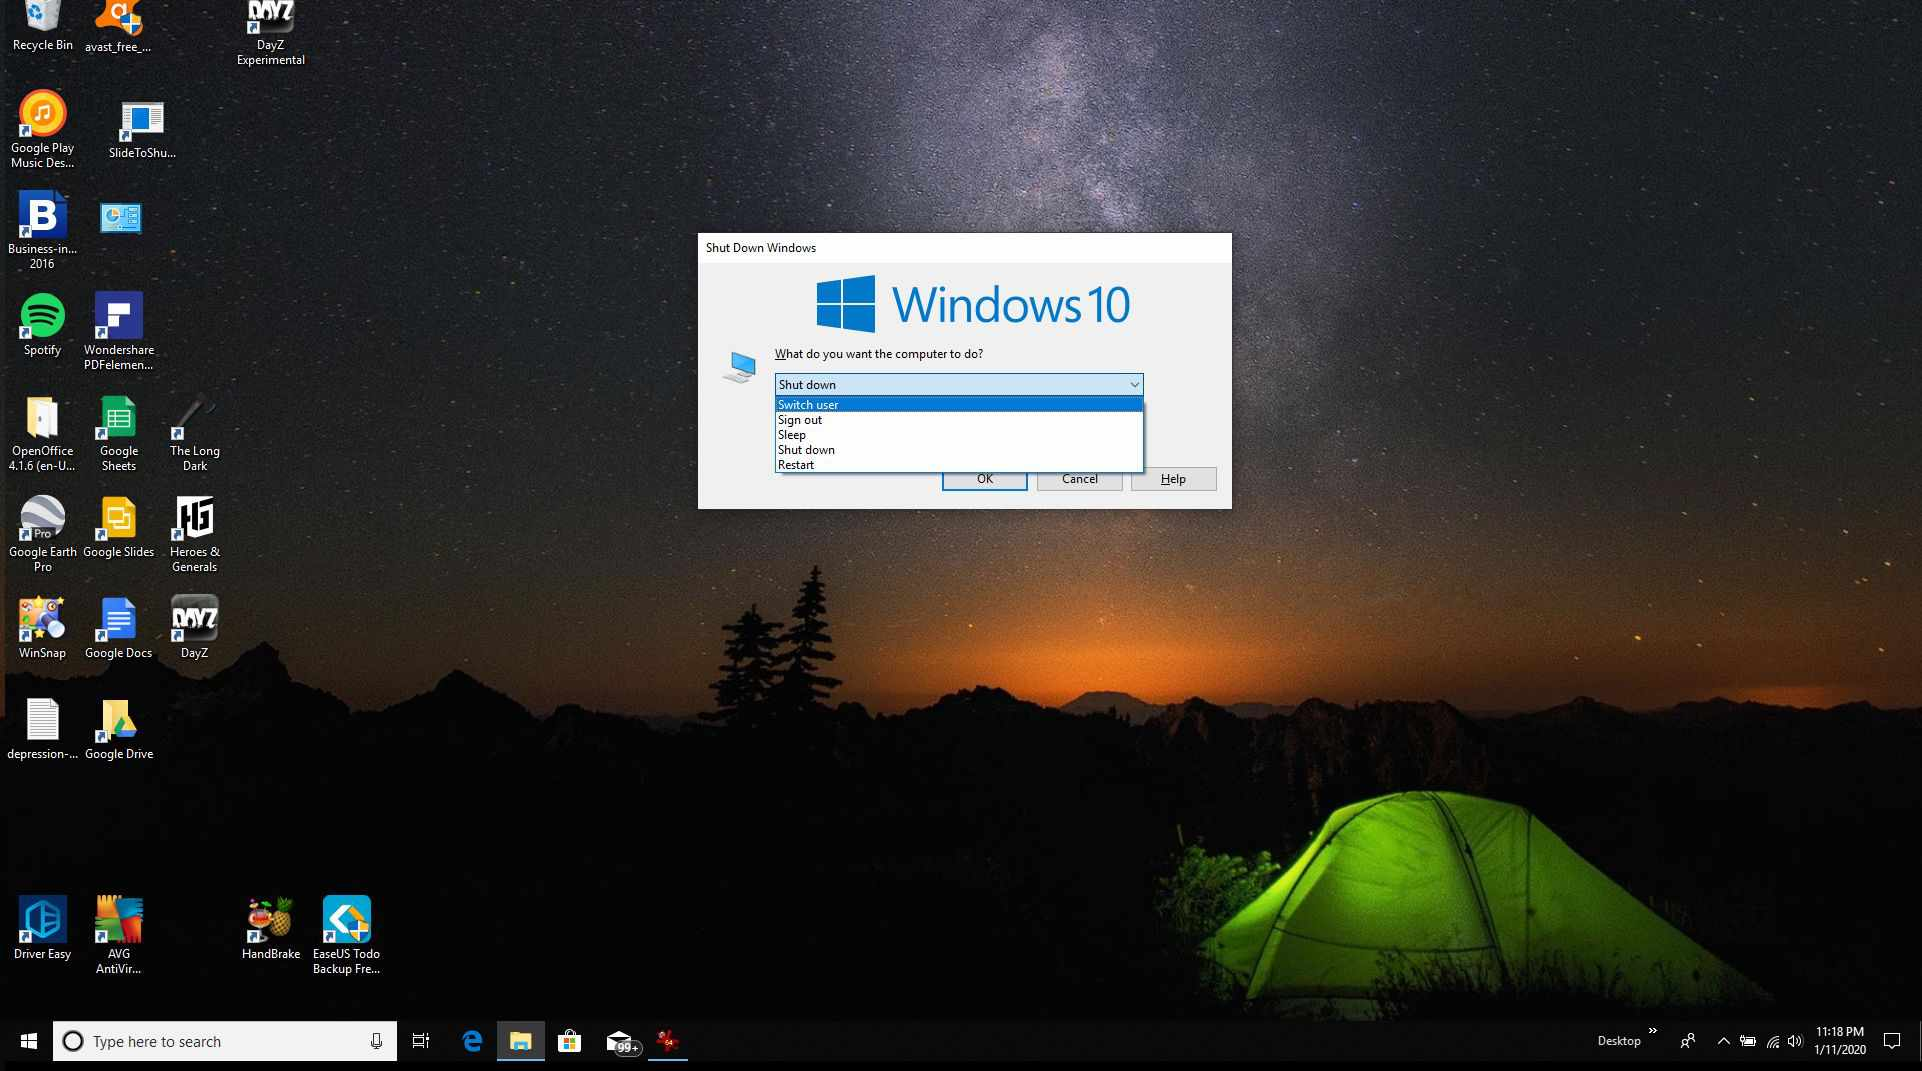 Screenshot of the Shut Down Windows window